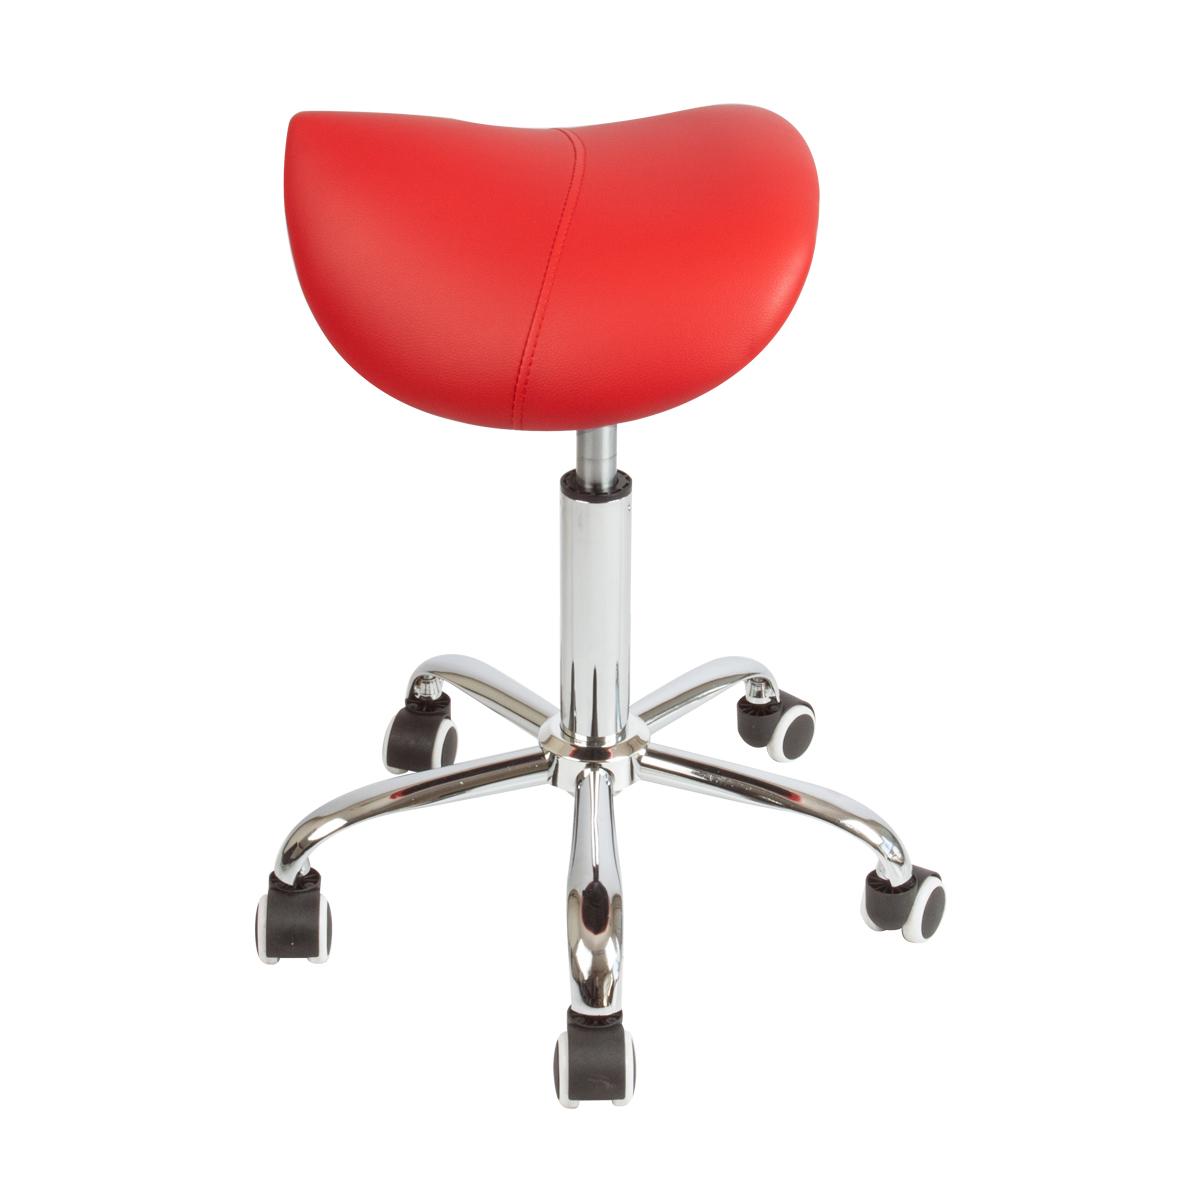 2 Spa Salon Stool Hydraulic Saddle Rolling Chair Tattoo